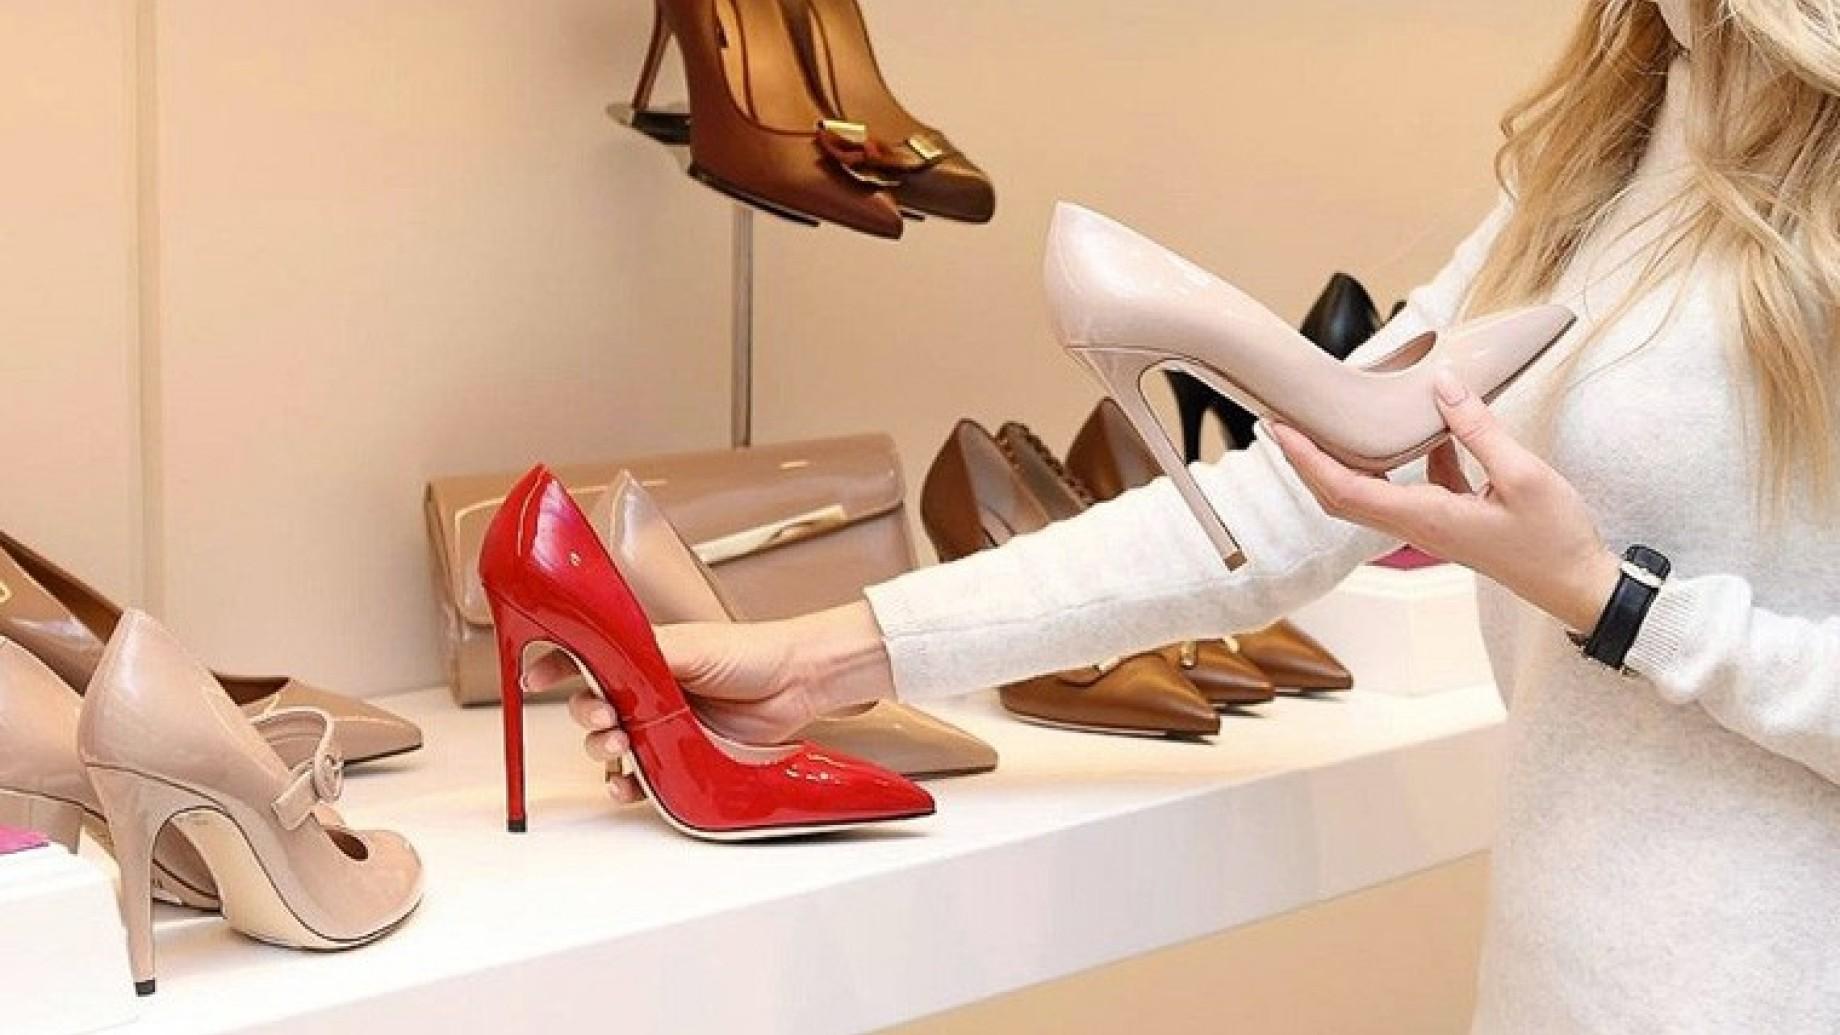 prvare scarpe